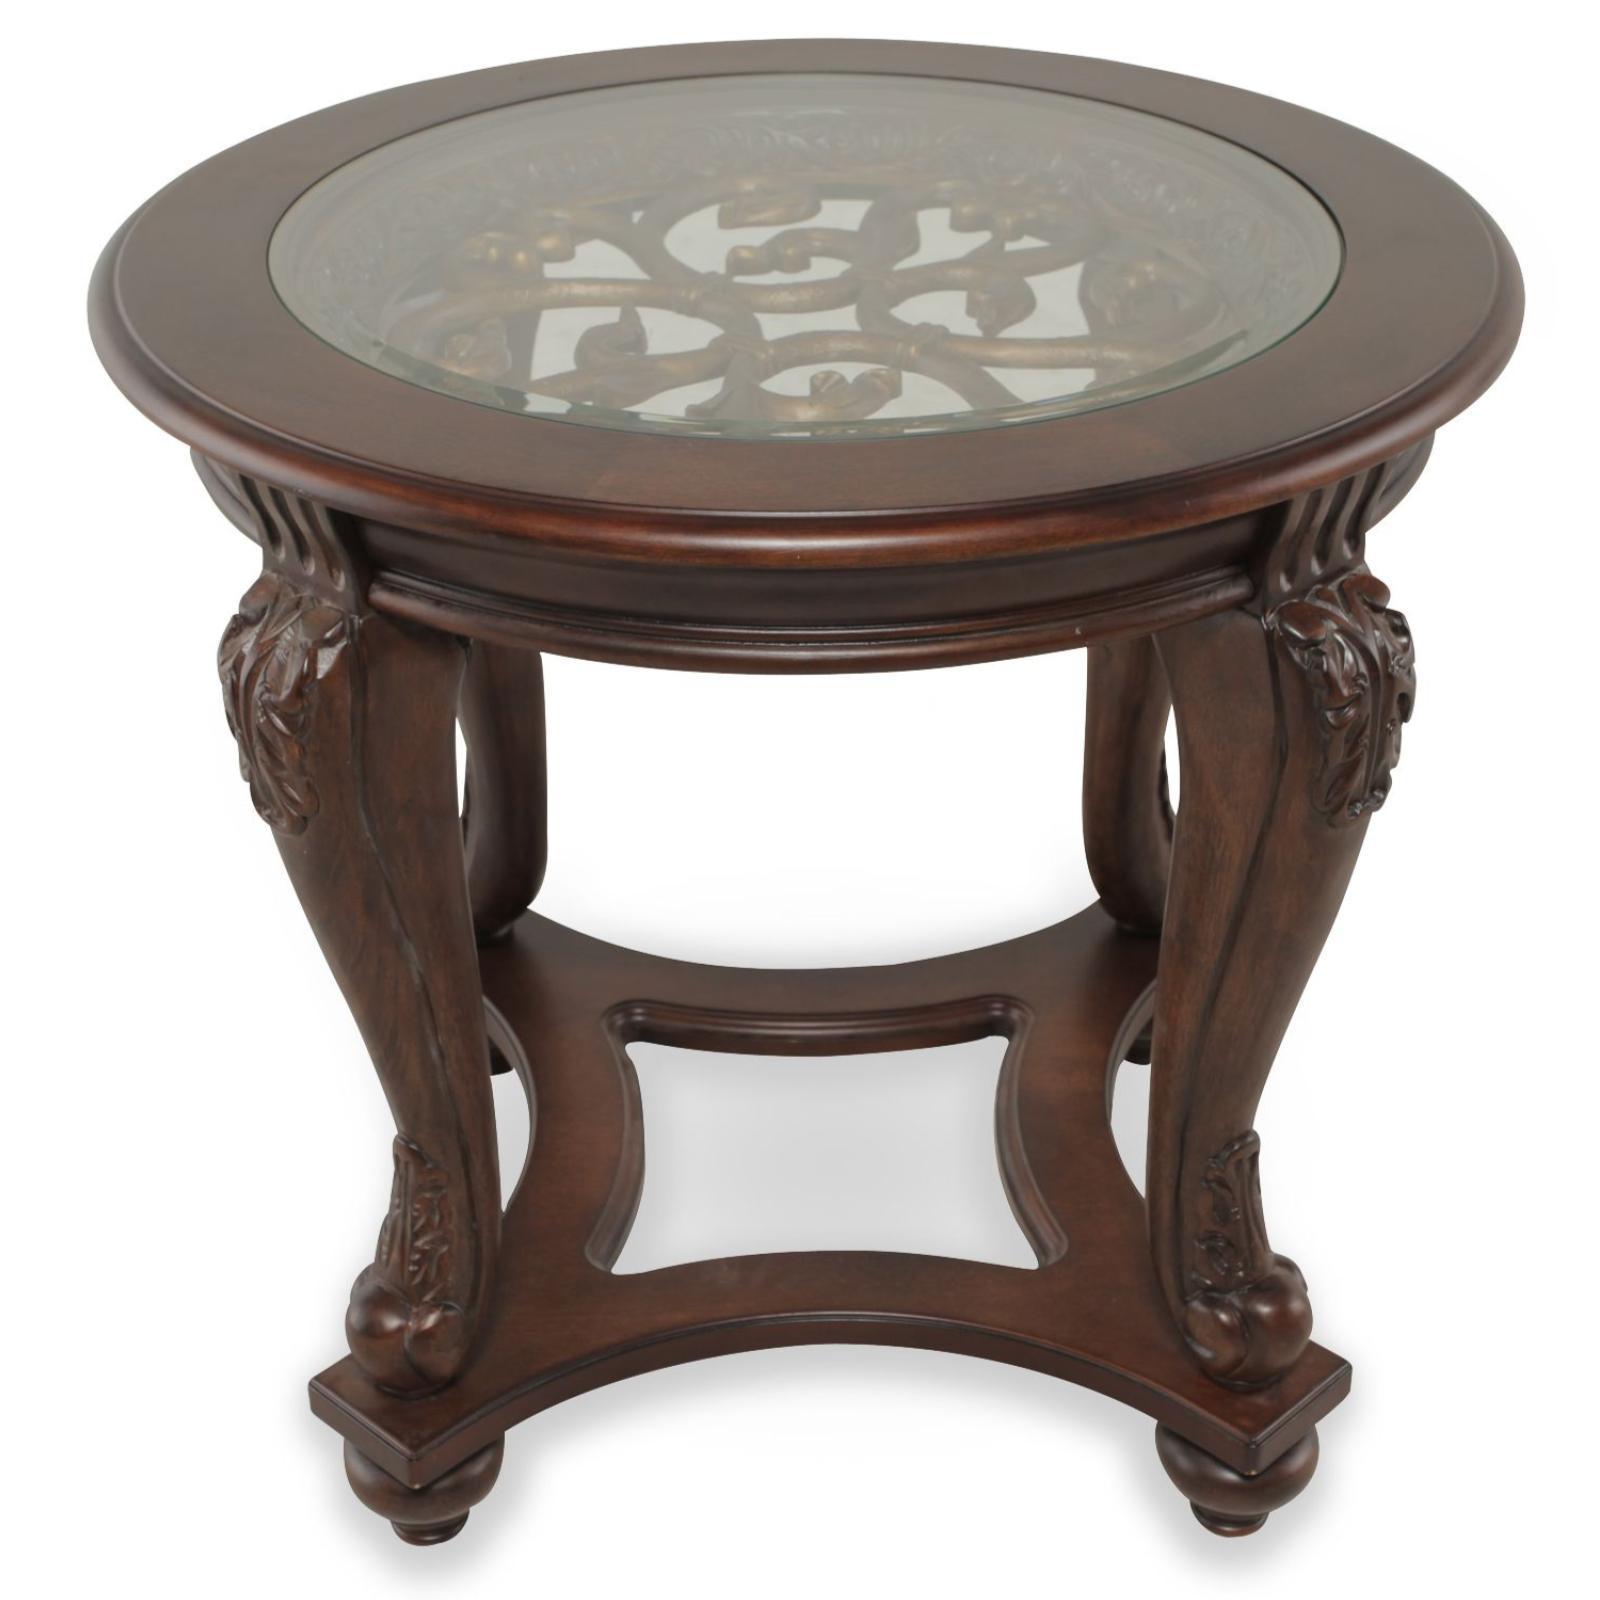 Norcastle Sofa Table: Liberty Lagana Furniture In Meriden, CT: Online Catalog Of